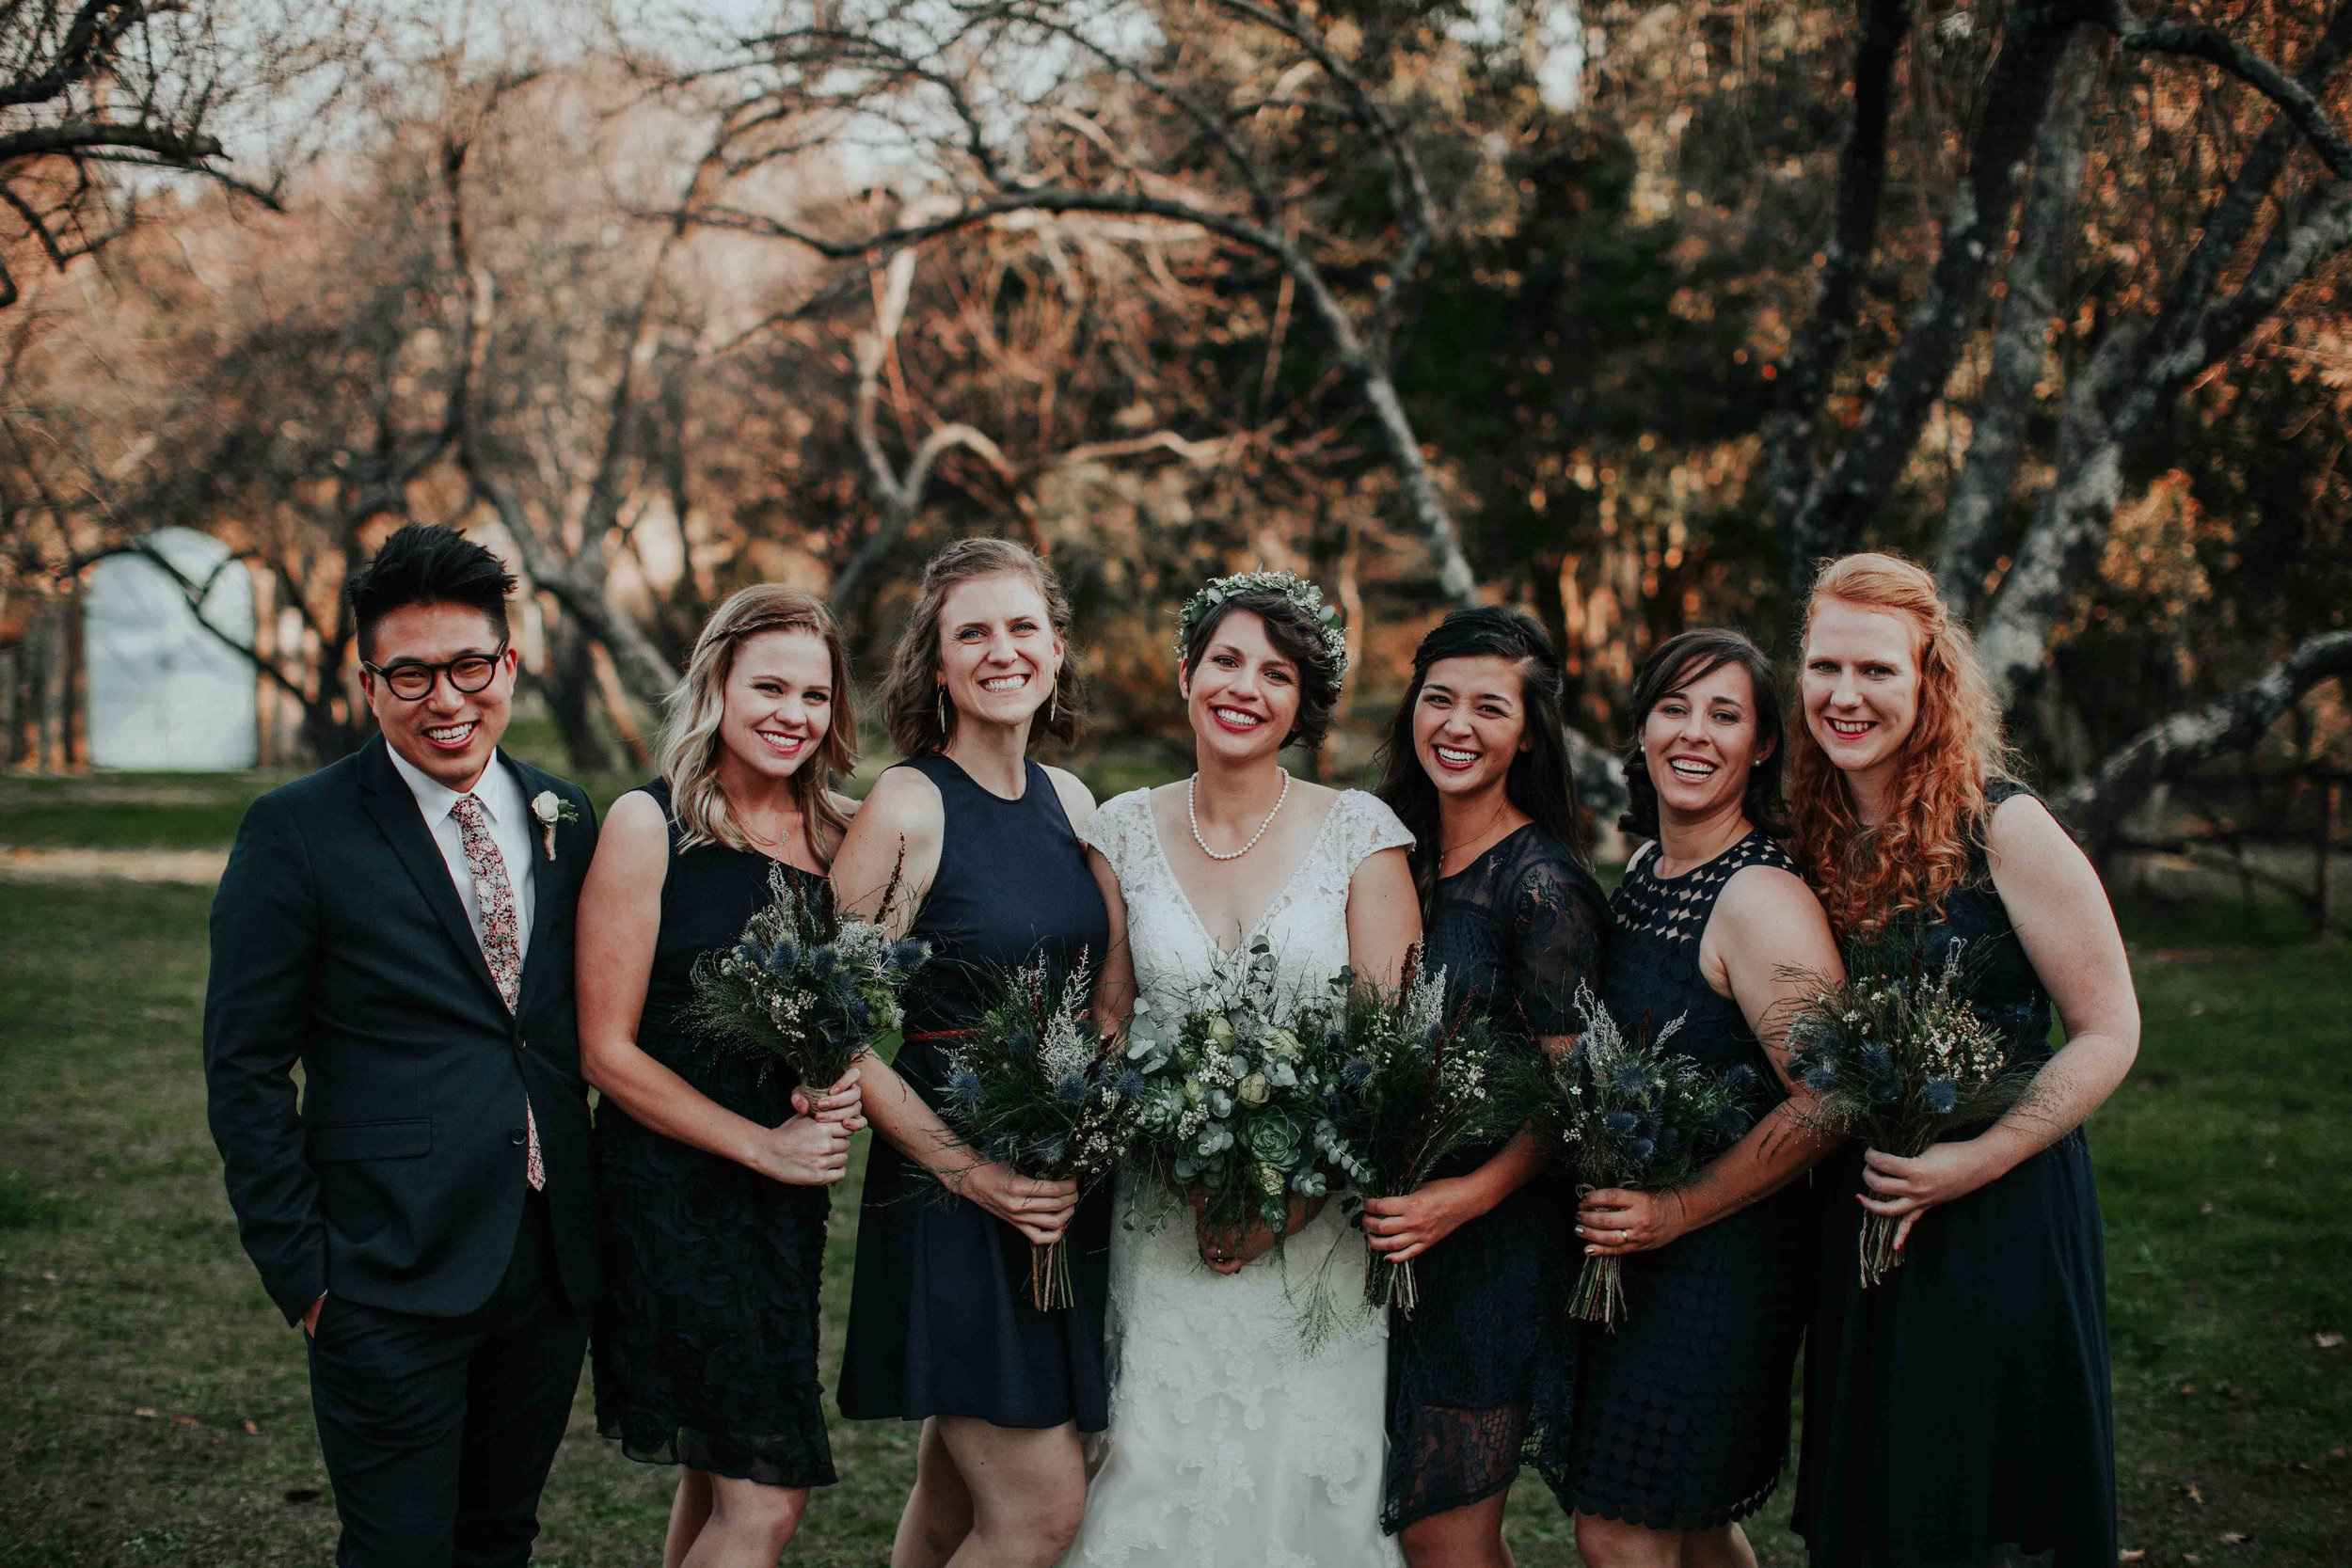 Kristi Smith Photography_Eloff&Jeanette_ Wedding Photographer 16.jpg